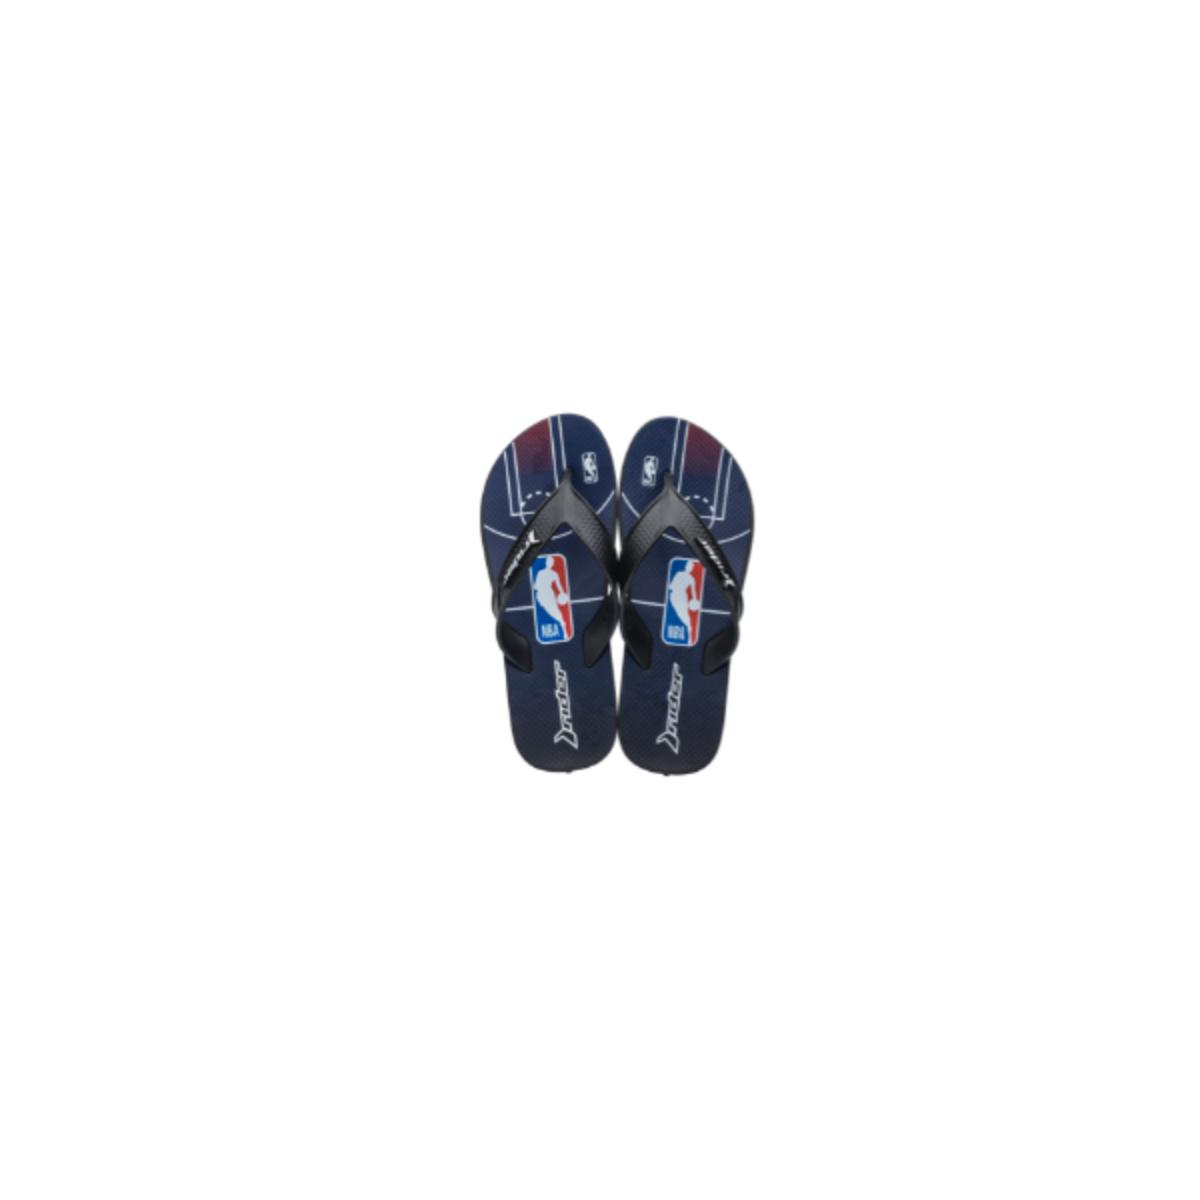 Chinelo Masculino Grendene 11585 25675 Rider Street Bold Preto/azul/branco